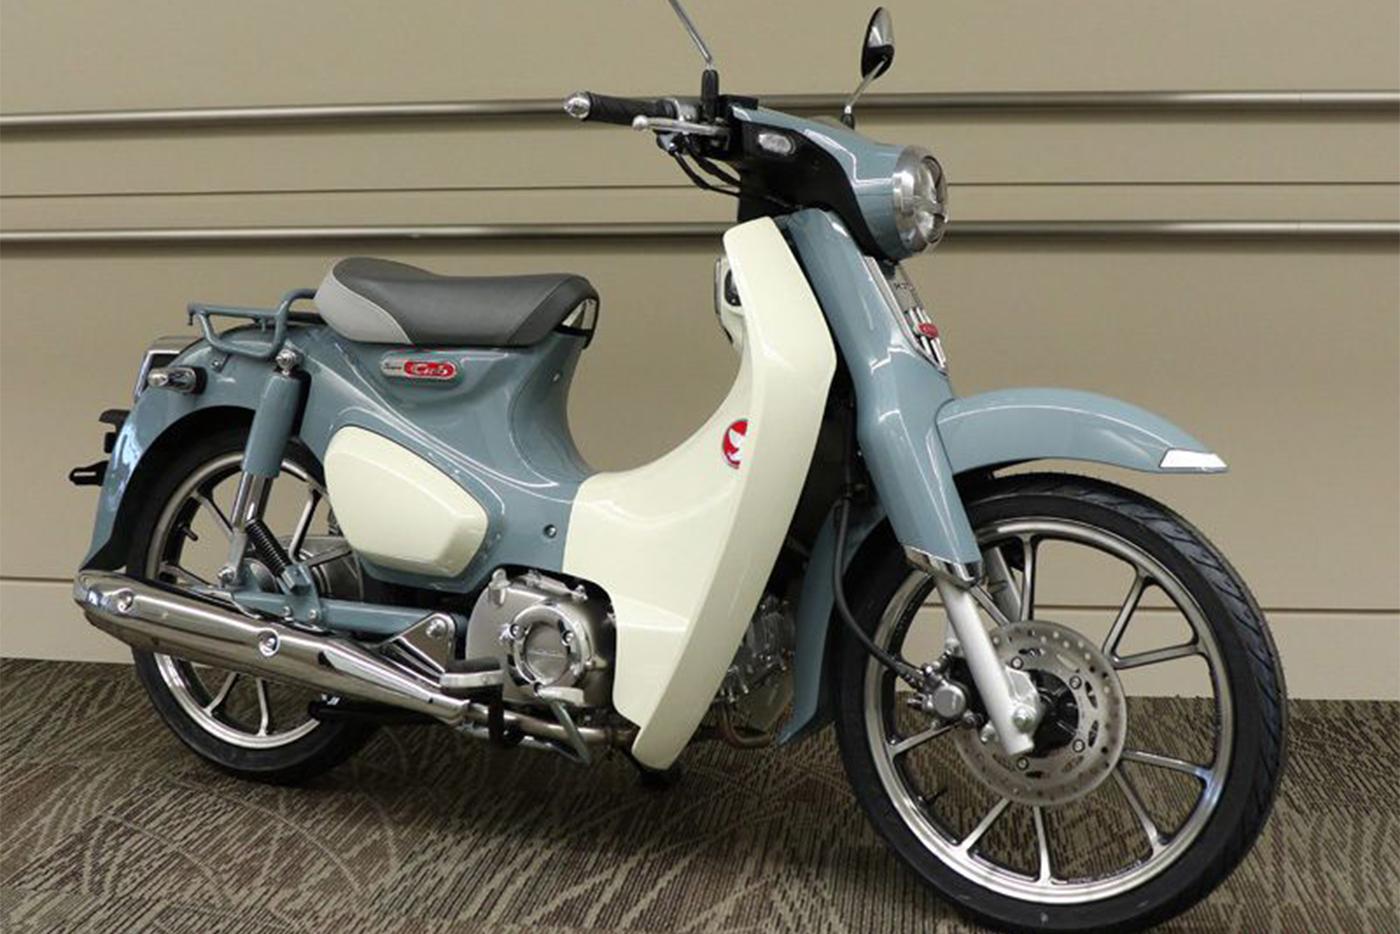 honda-supercub-c125-model-2020-pearl-cadet-grey-mau-lien-tuc-2.jpg